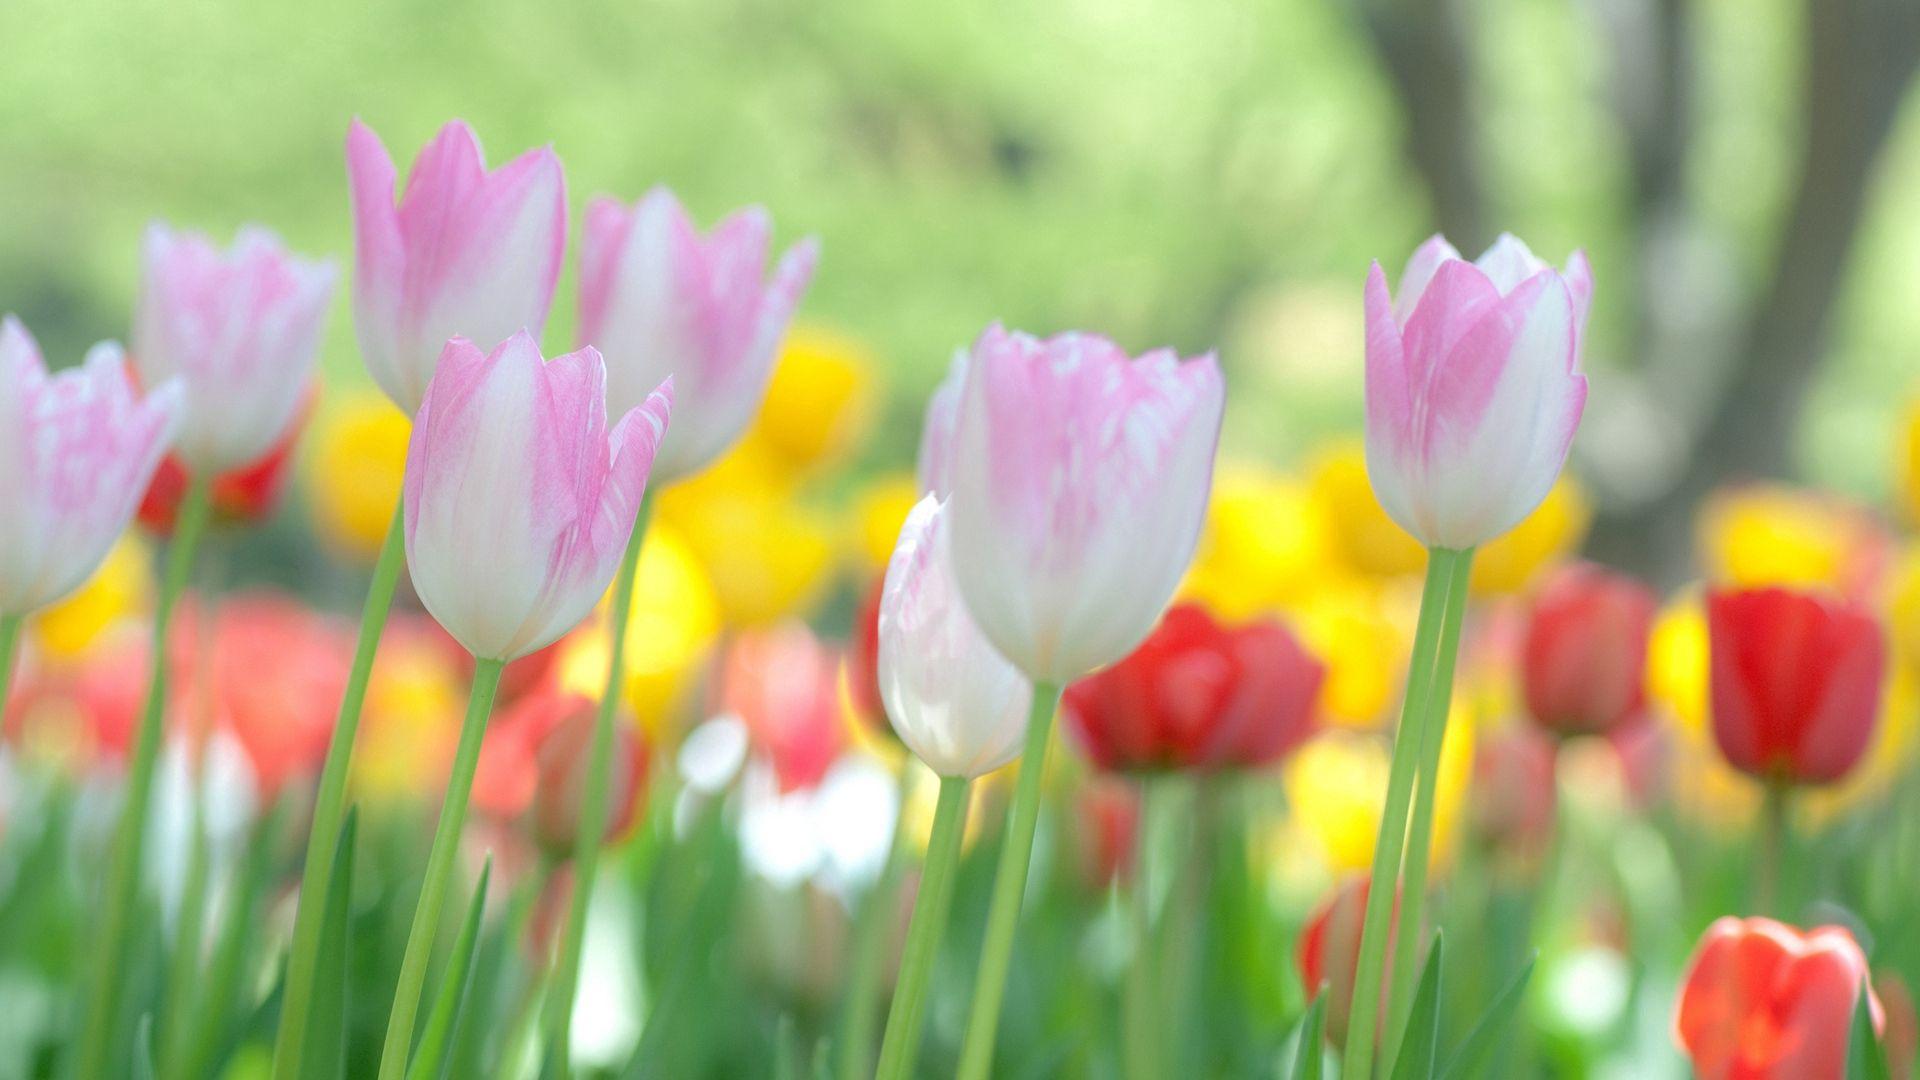 142982 descargar fondo de pantalla Flores, Campo, Hierba, Tulipanes: protectores de pantalla e imágenes gratis